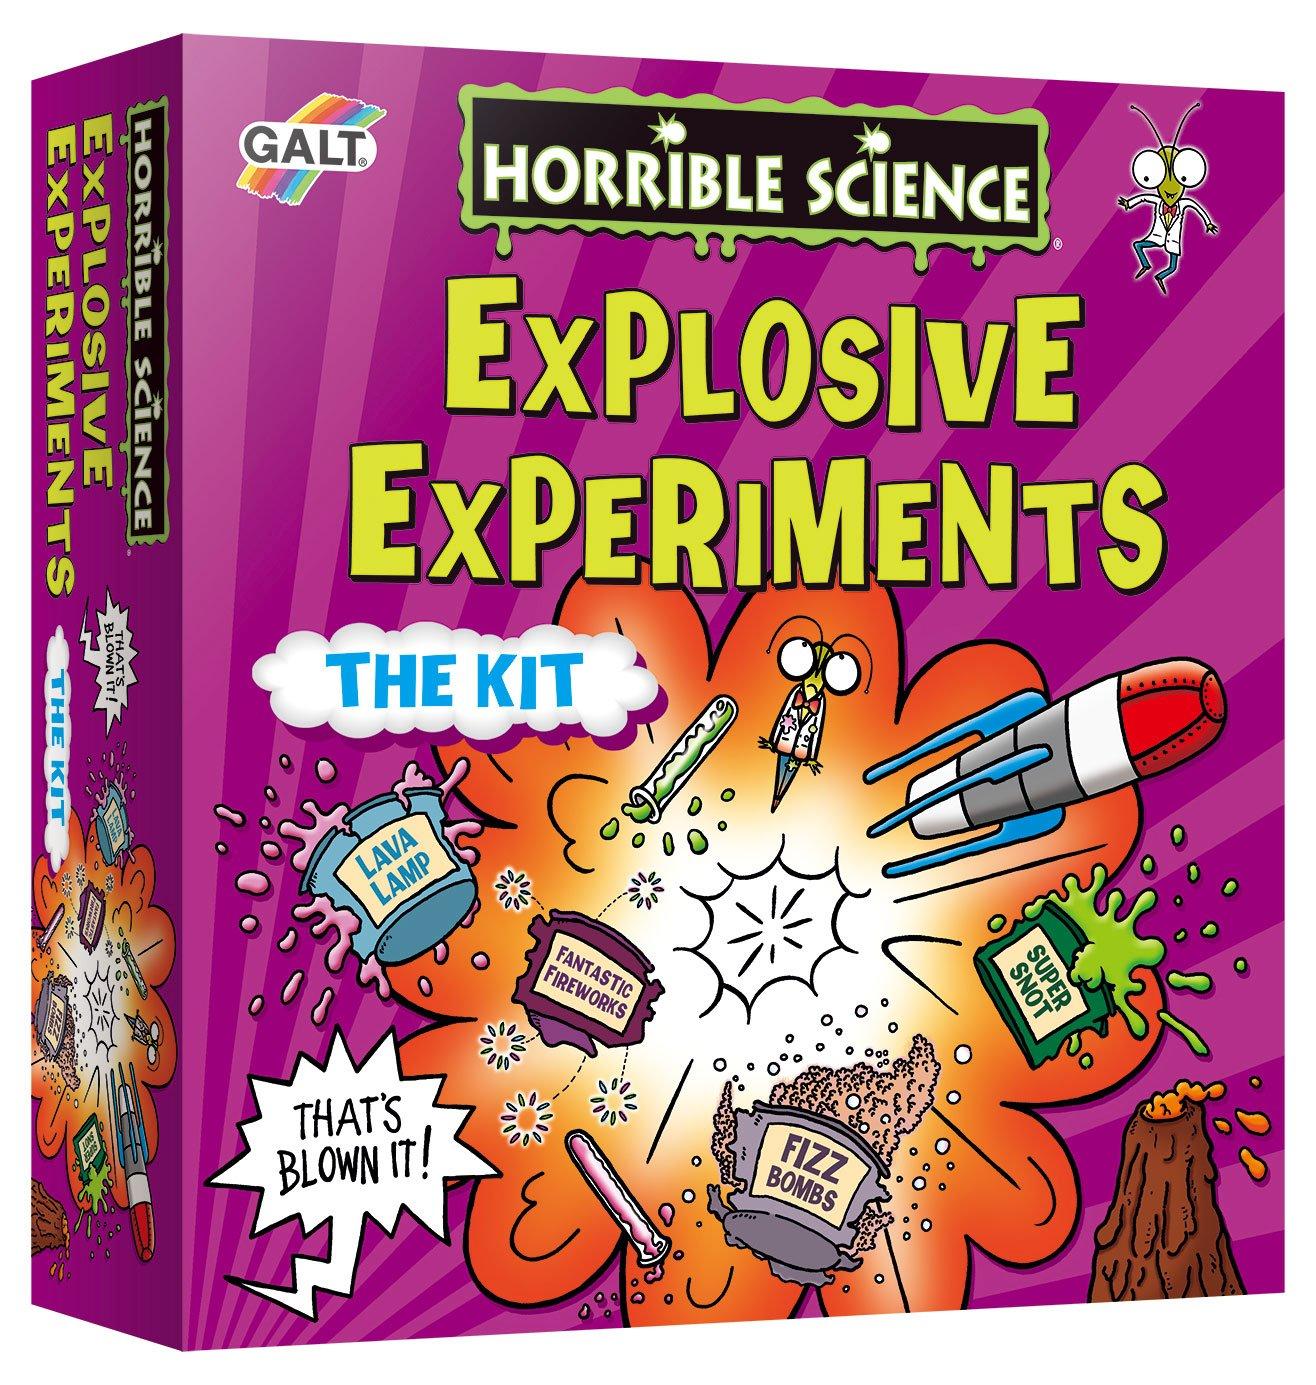 Horrible Science Experiment, Explosive Experiments